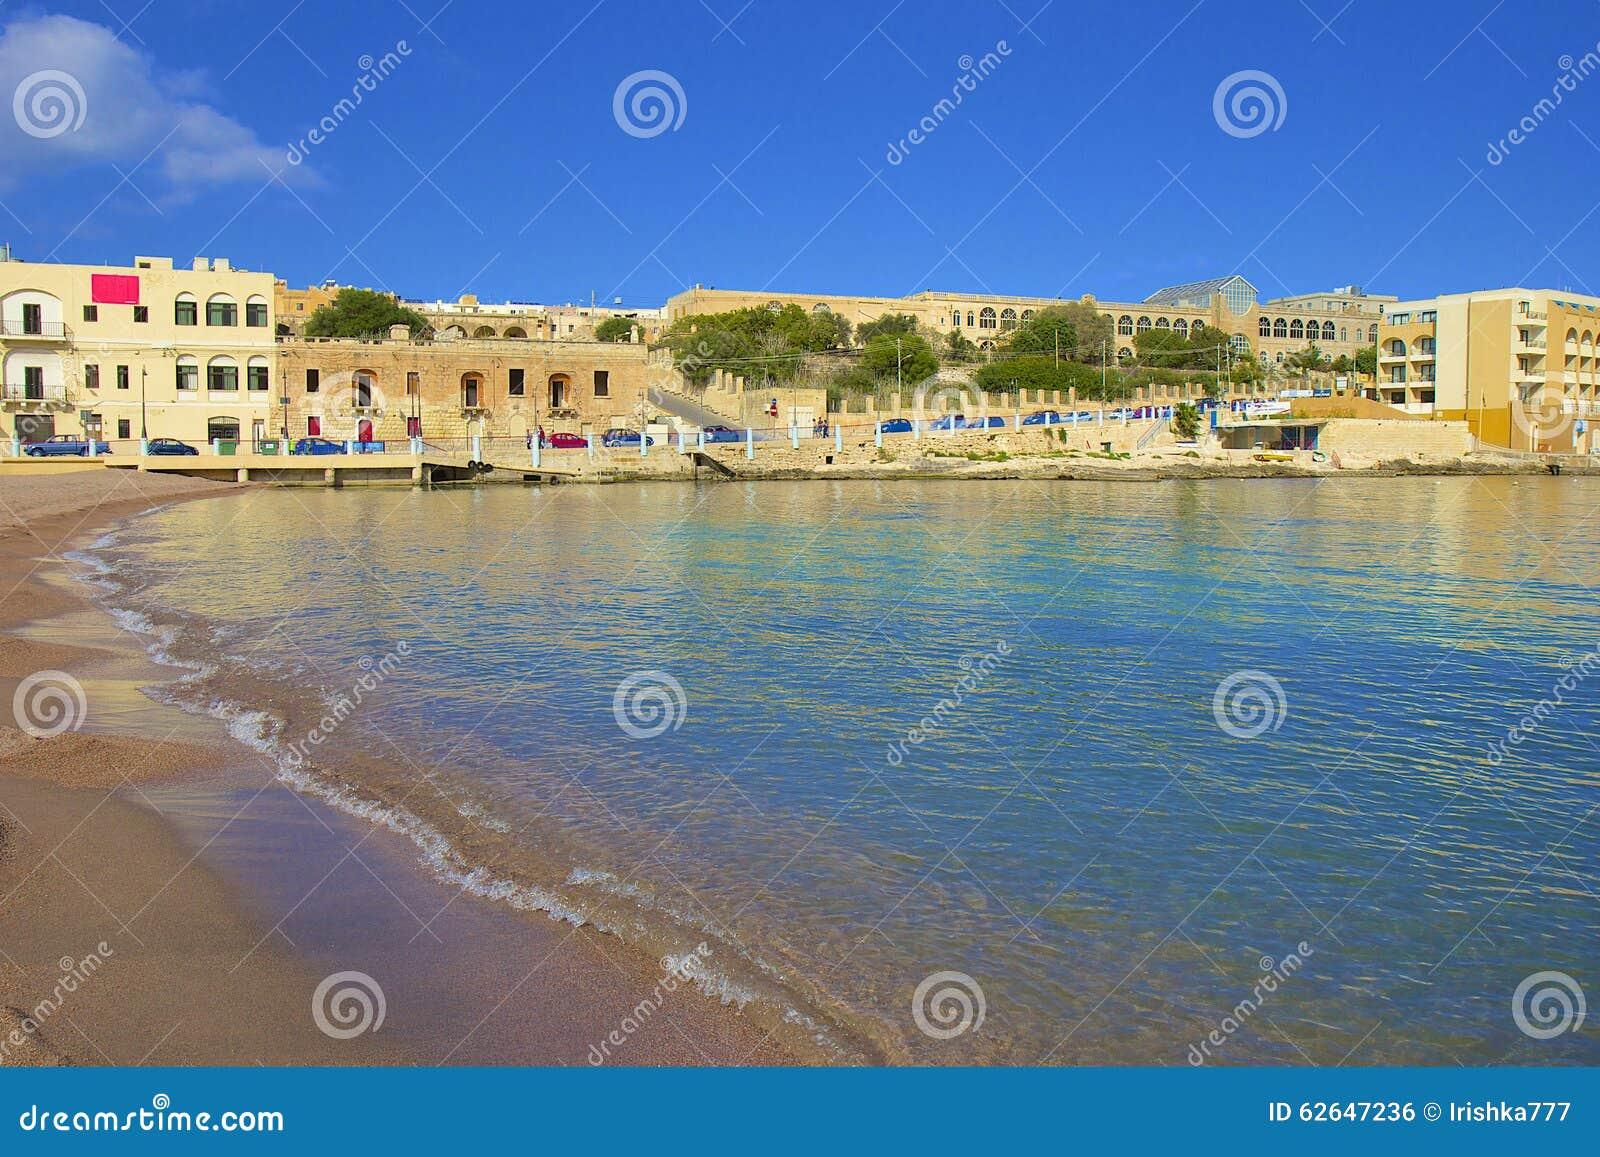 La baia di St George, st Julians, Malta